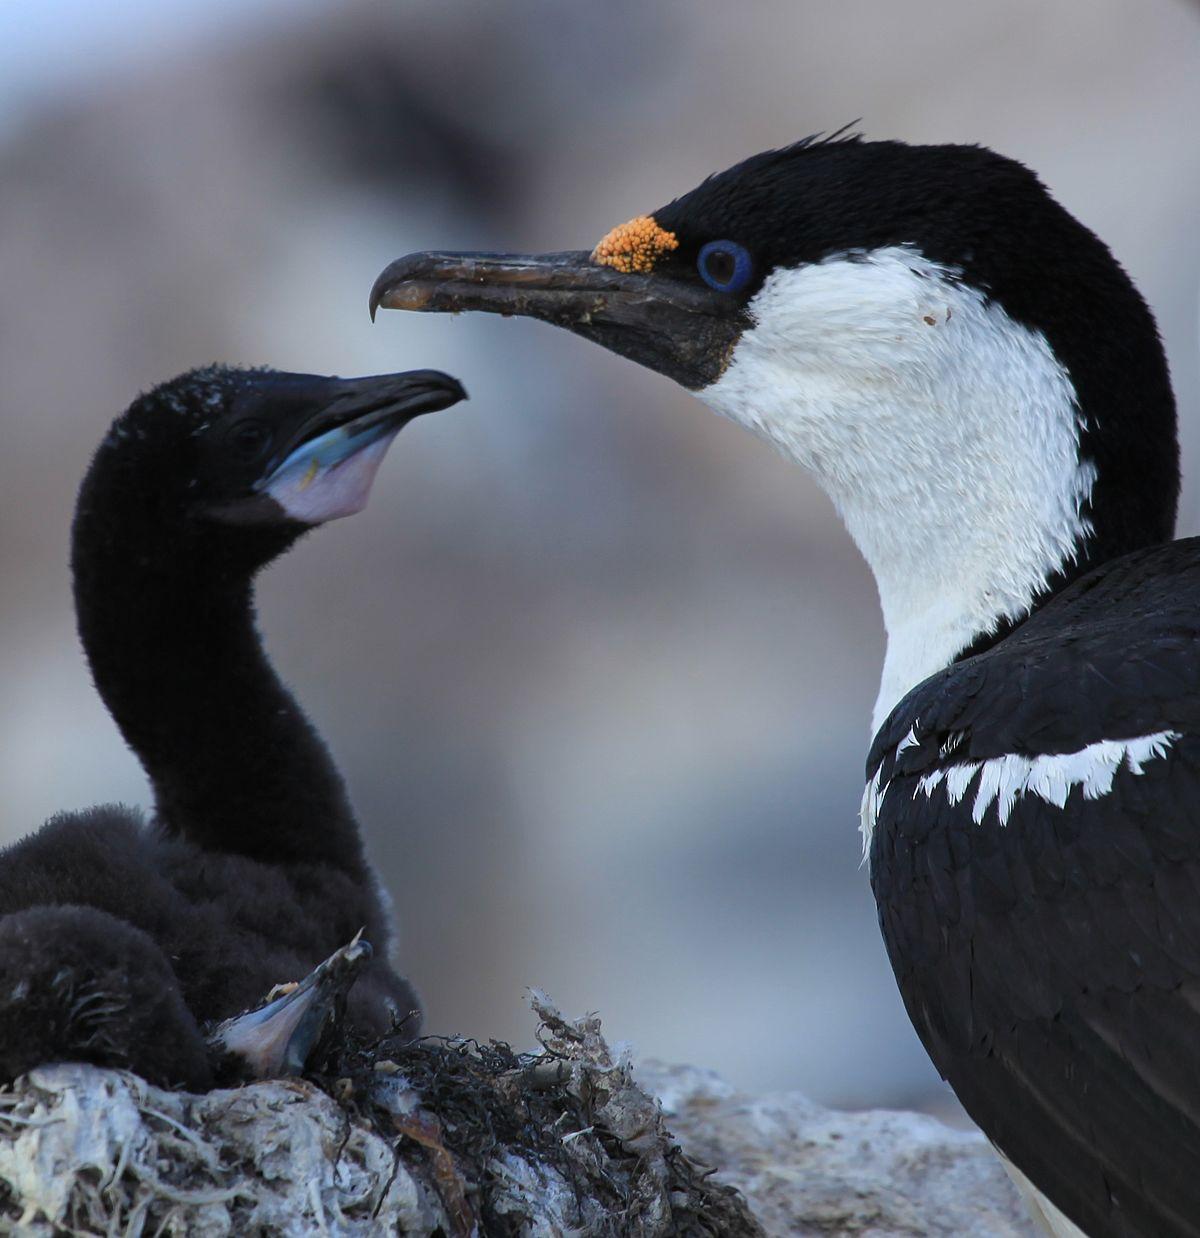 Antarctic shag - Wikipedia - photo#31